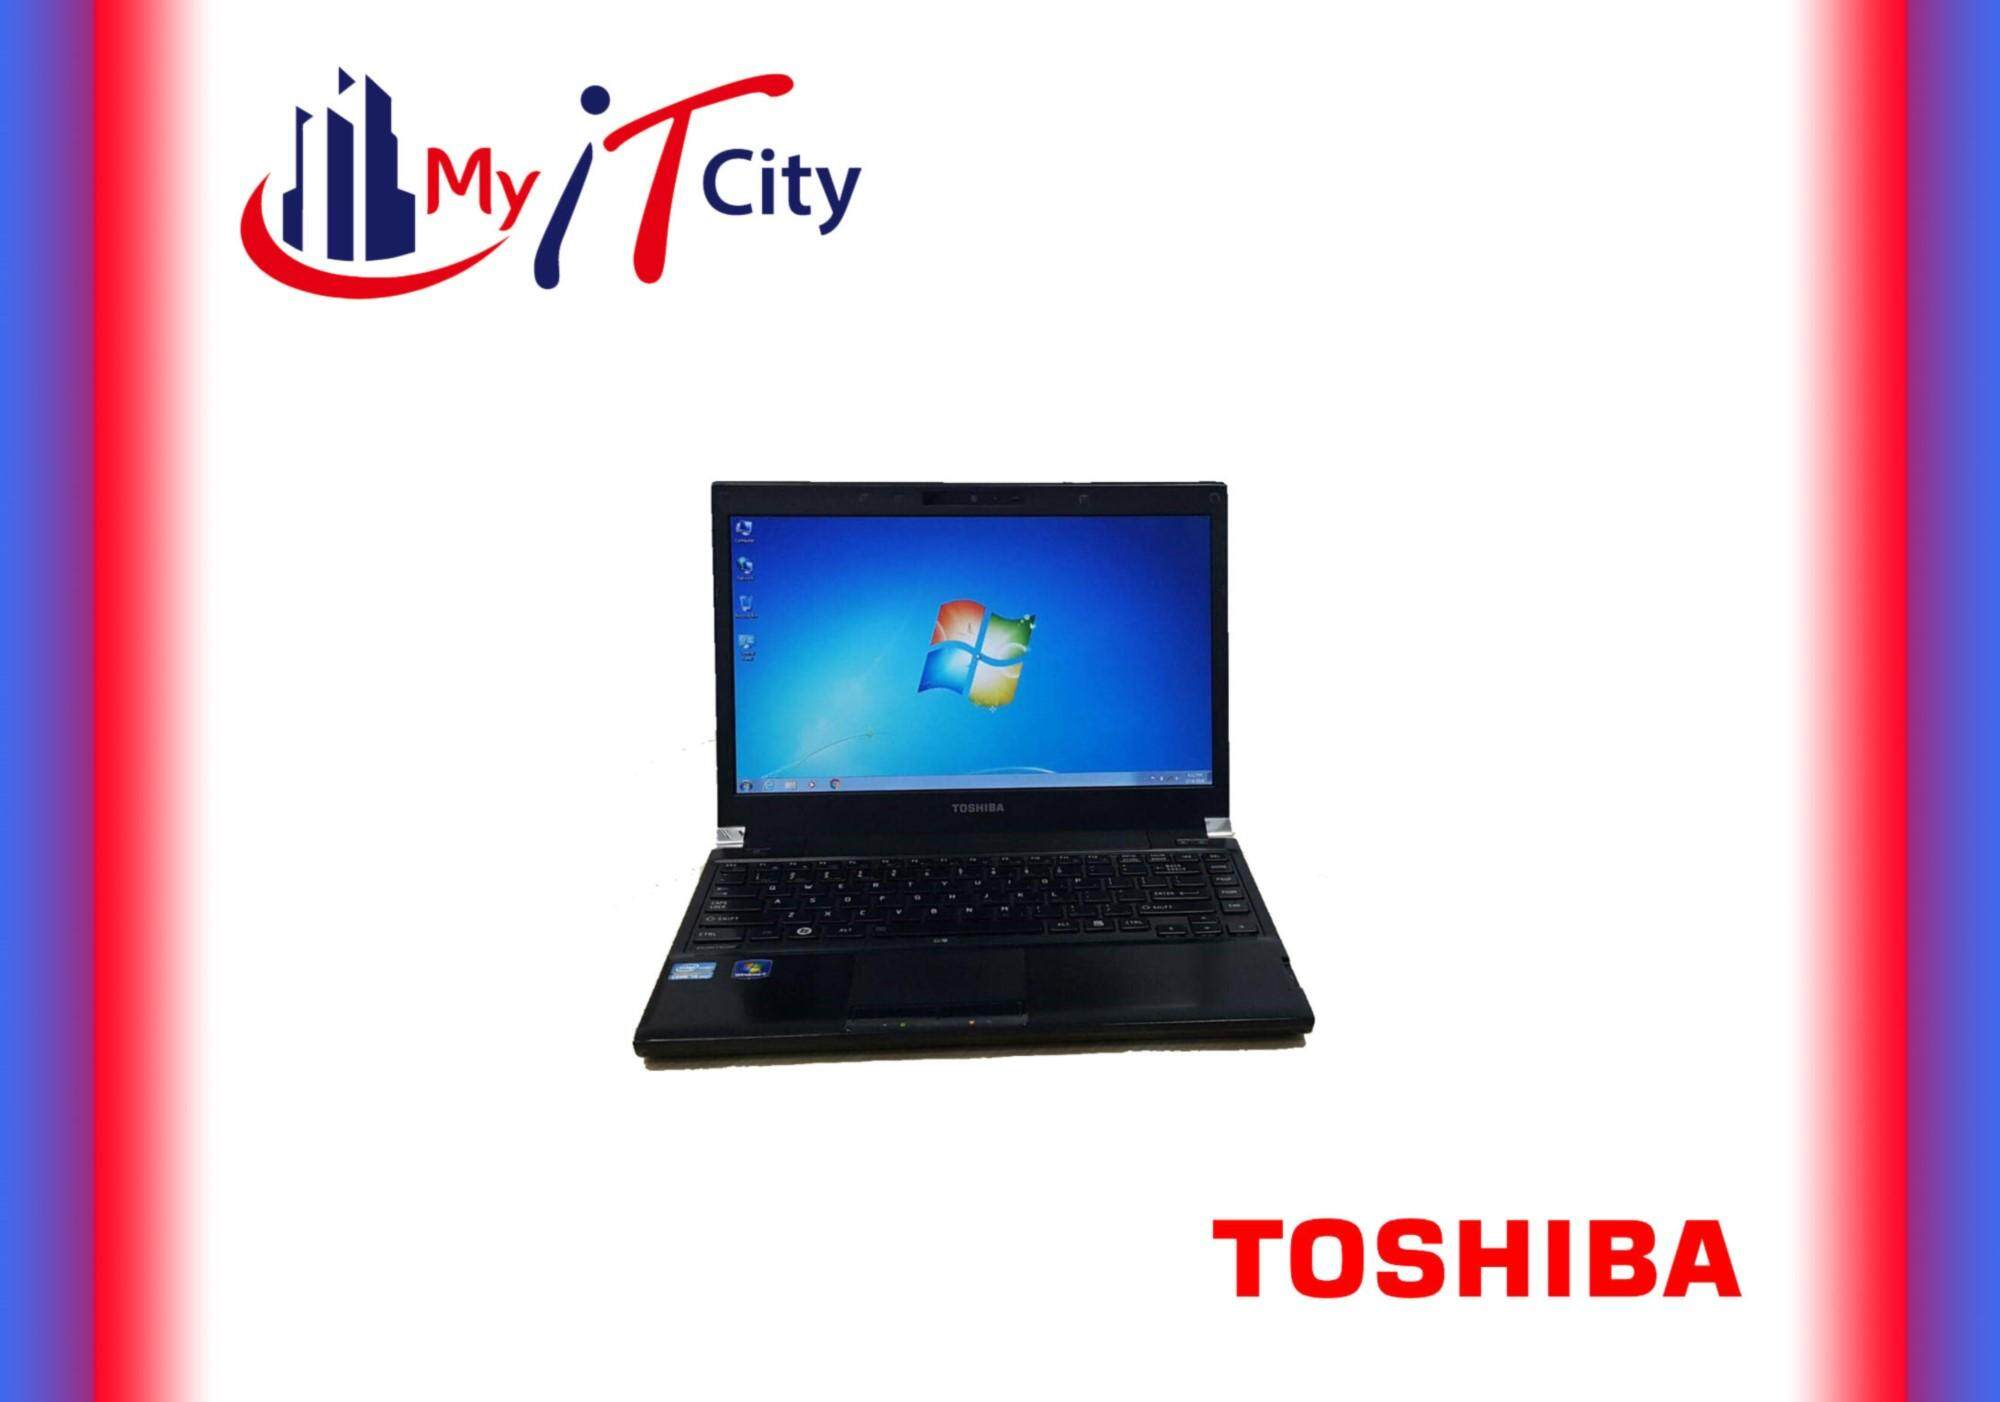 (Refurbished) Toshiba Protégé R830 Laptop - i5 / 4G / SSD Malaysia